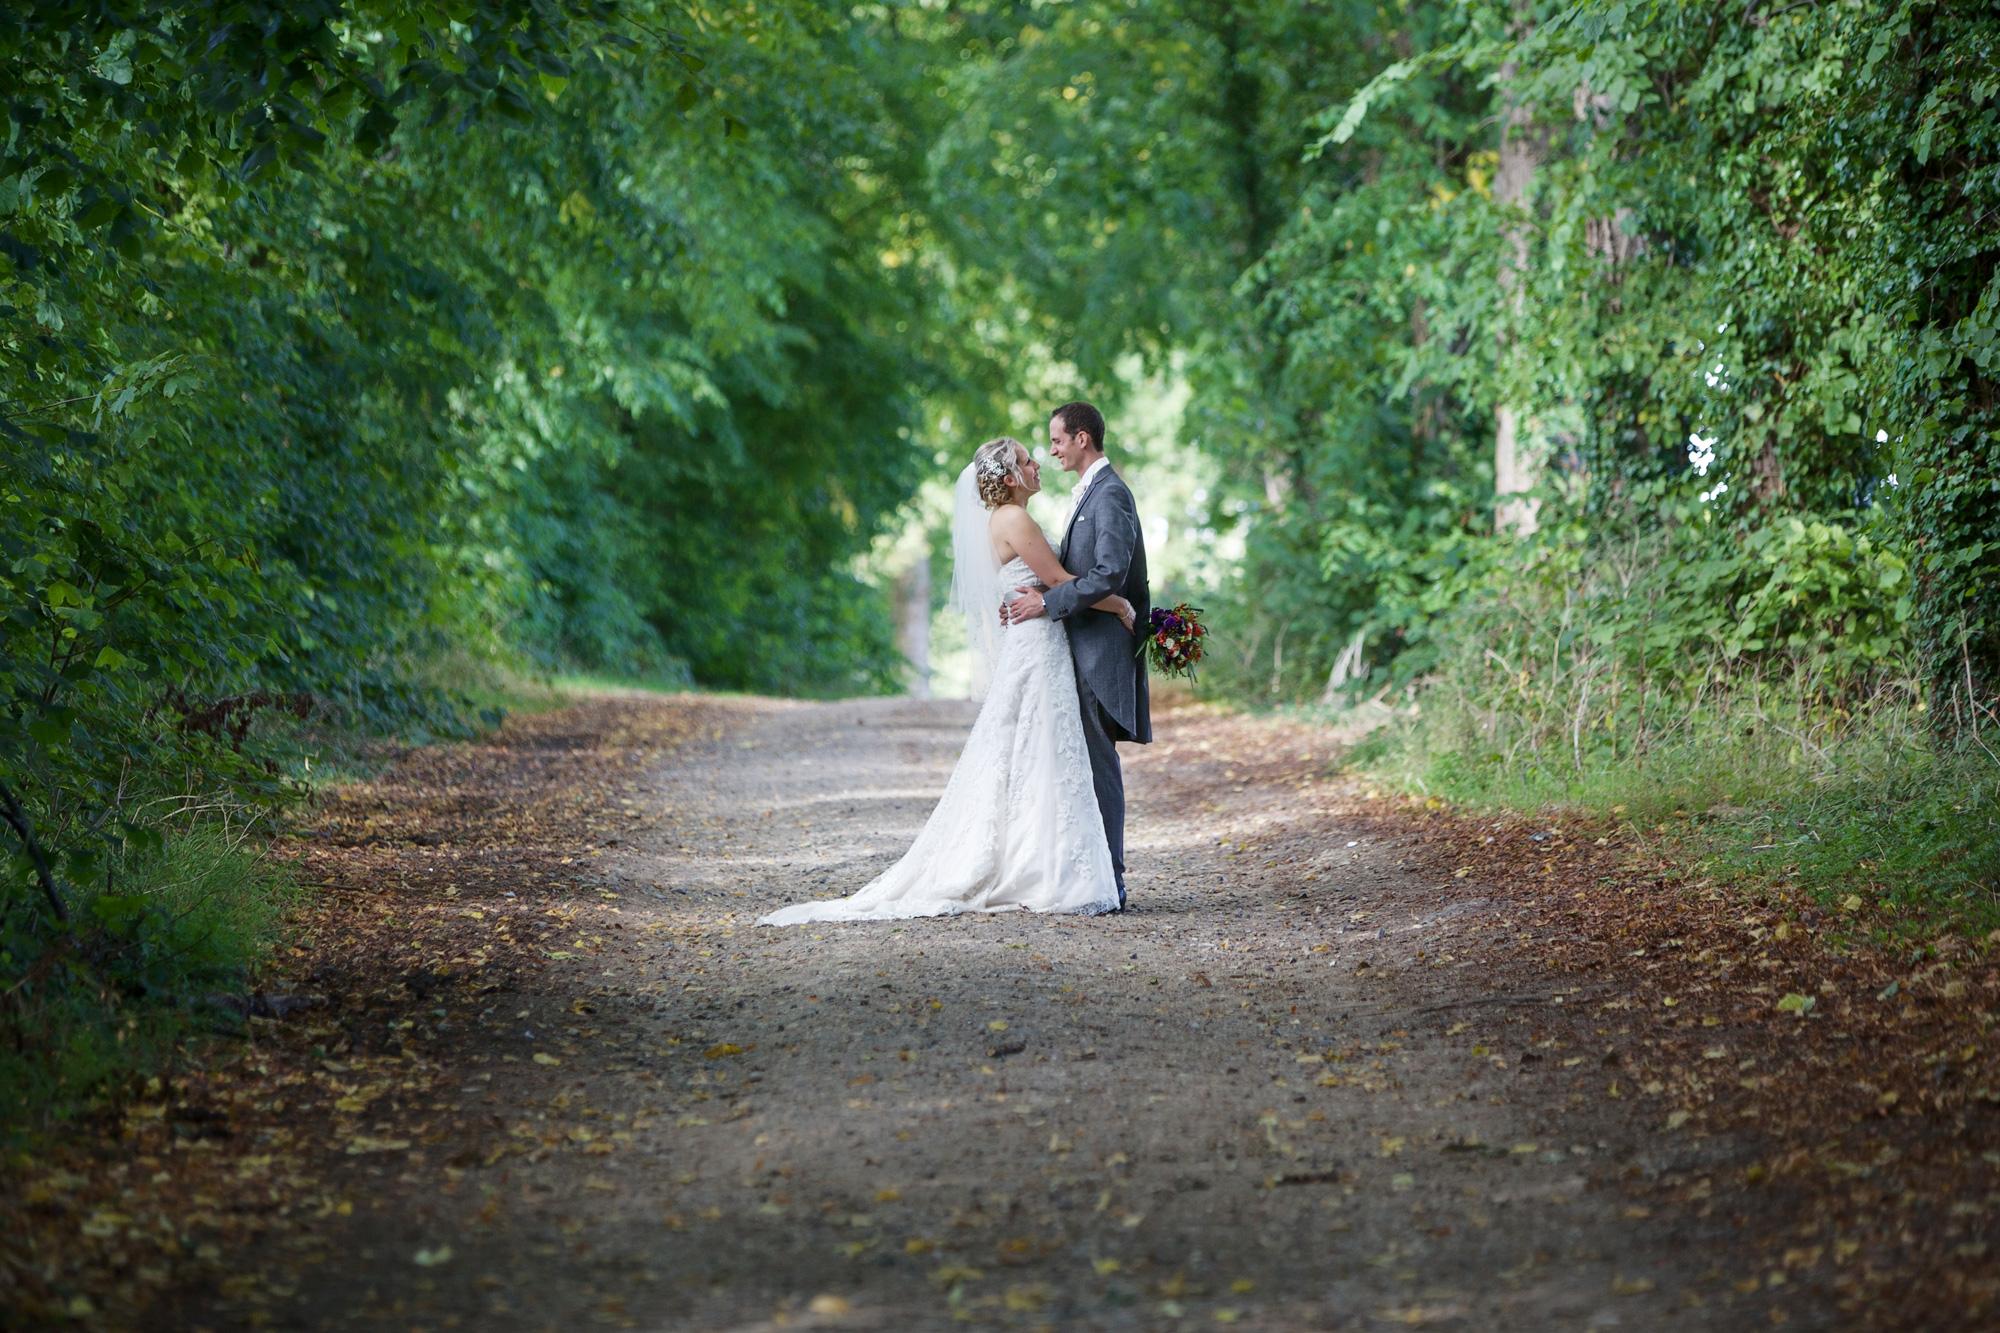 Adam_Hillier_Wedding_Photographer_Newbury_Berkshire_7 (5).jpg